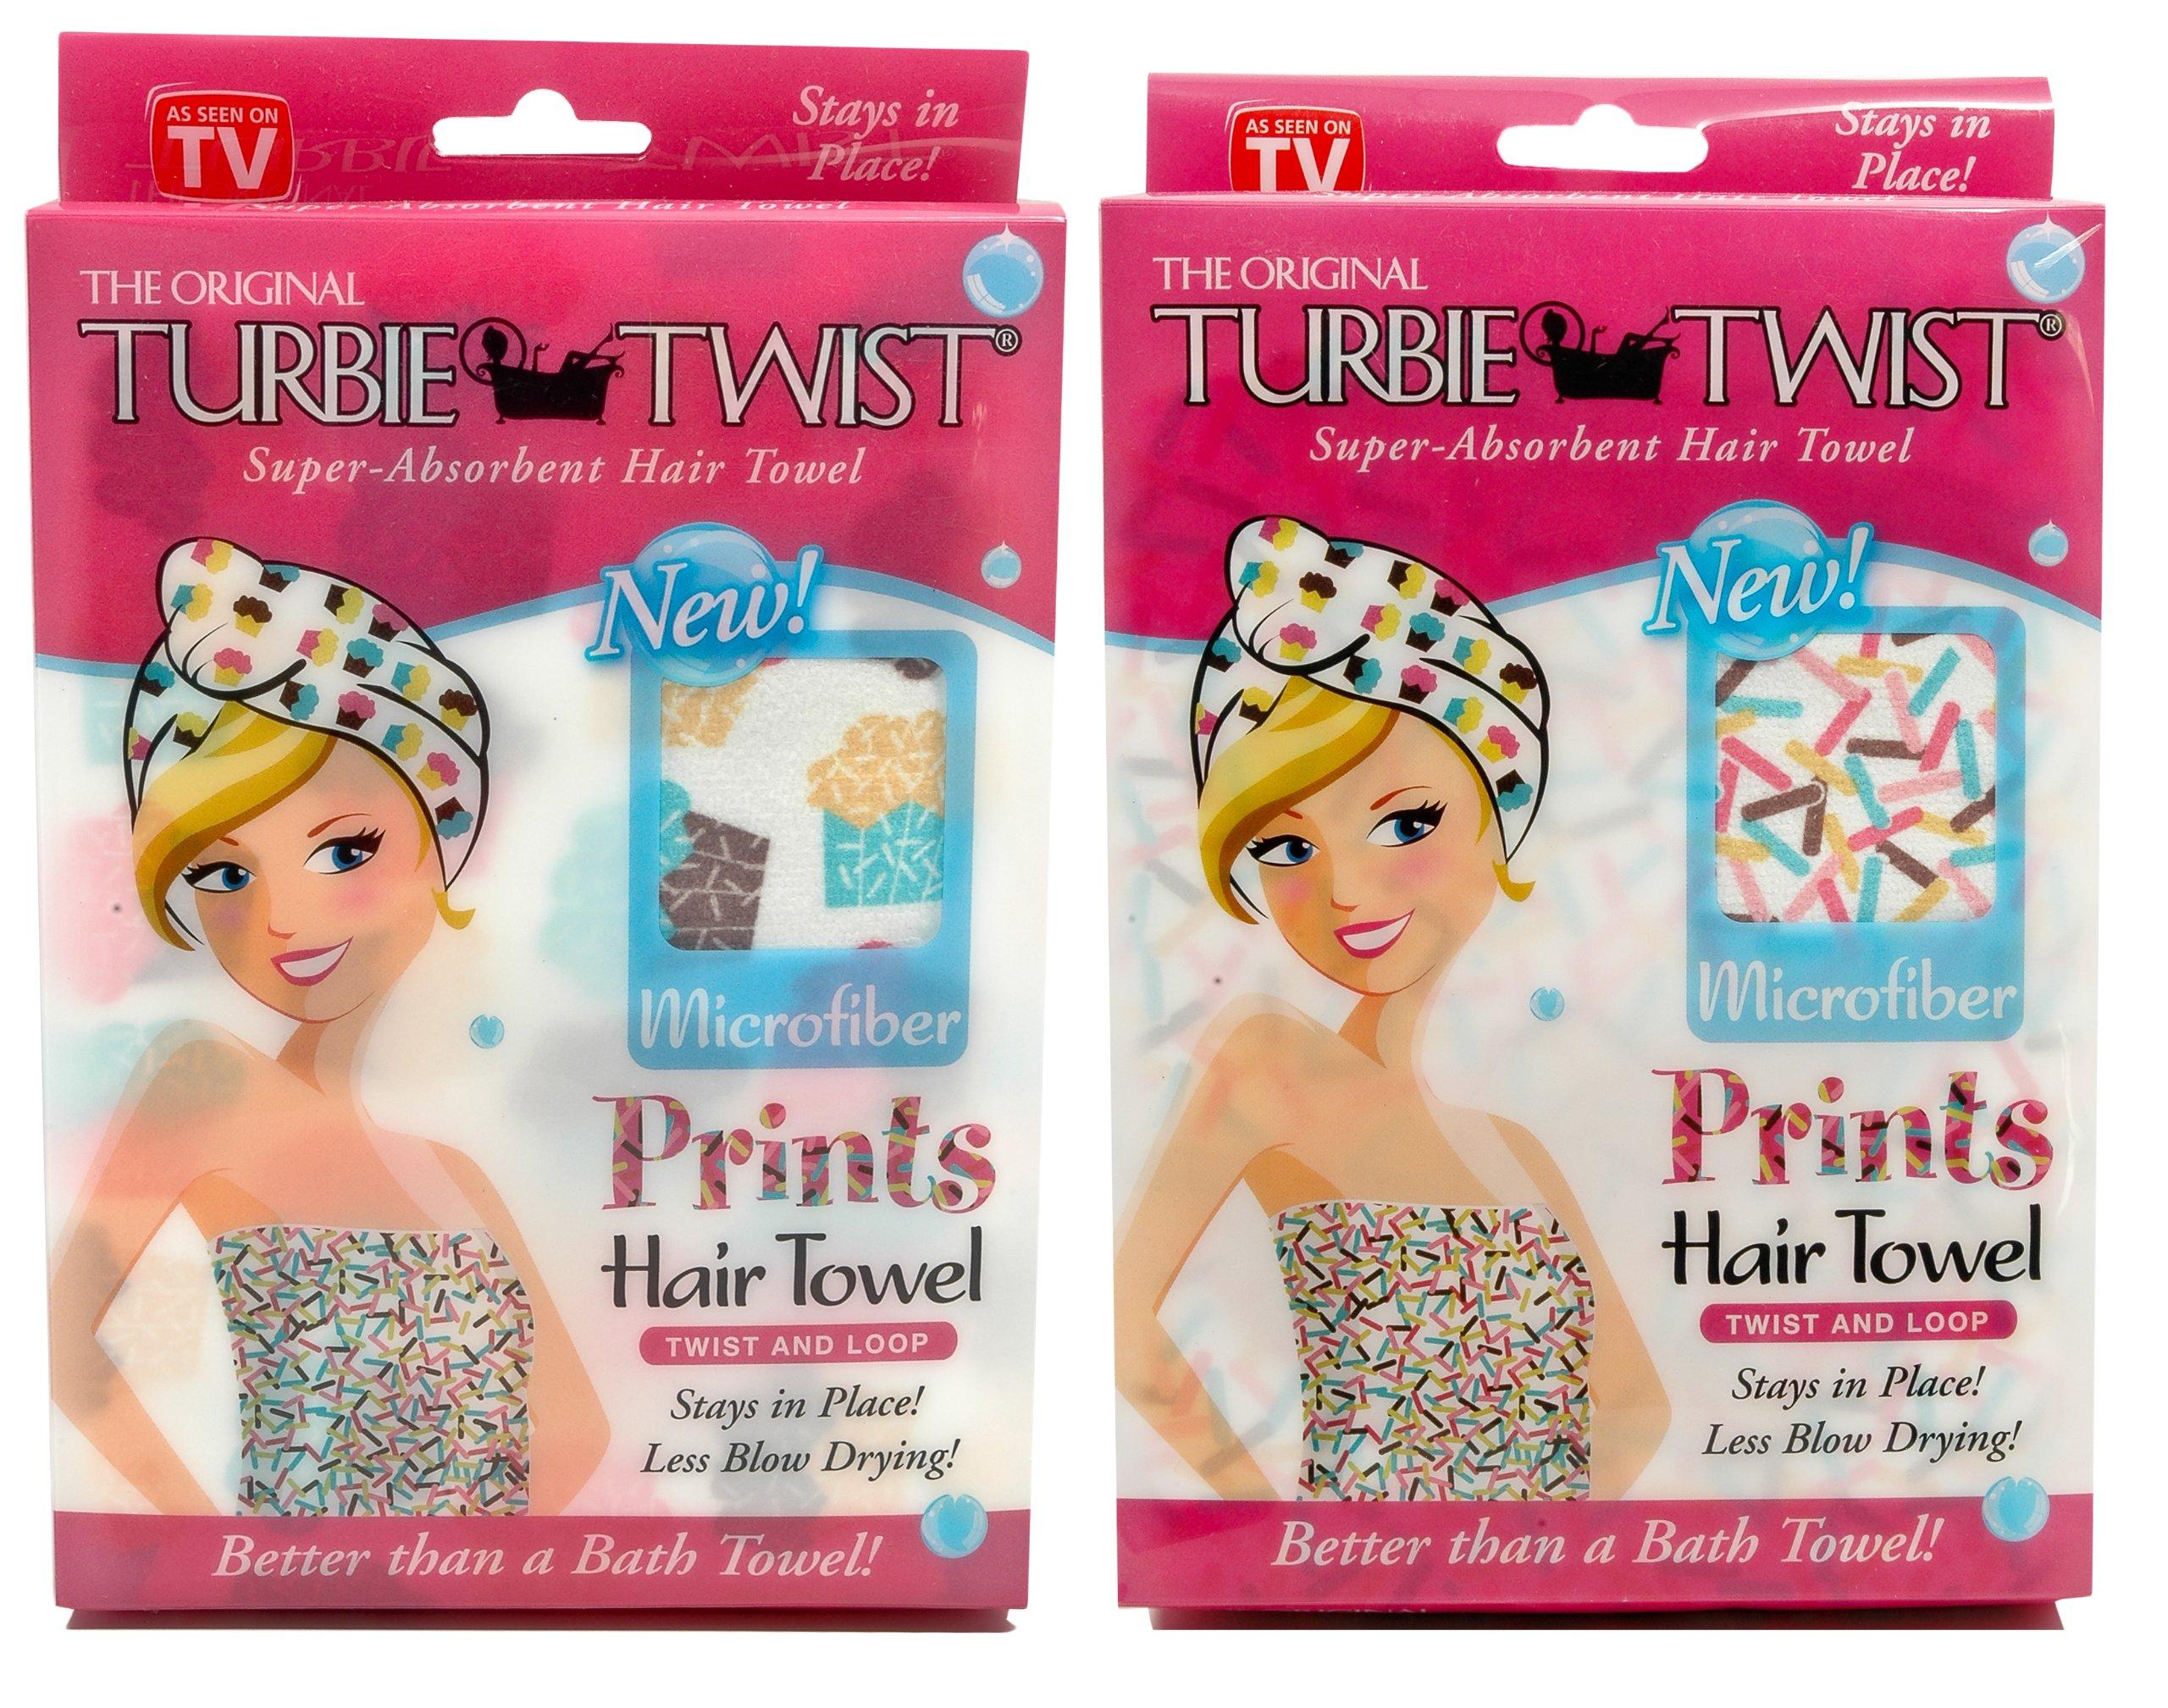 Original Turbie Twist Super Absorbent Hair Towel Microfiber Prints Embroidered 3